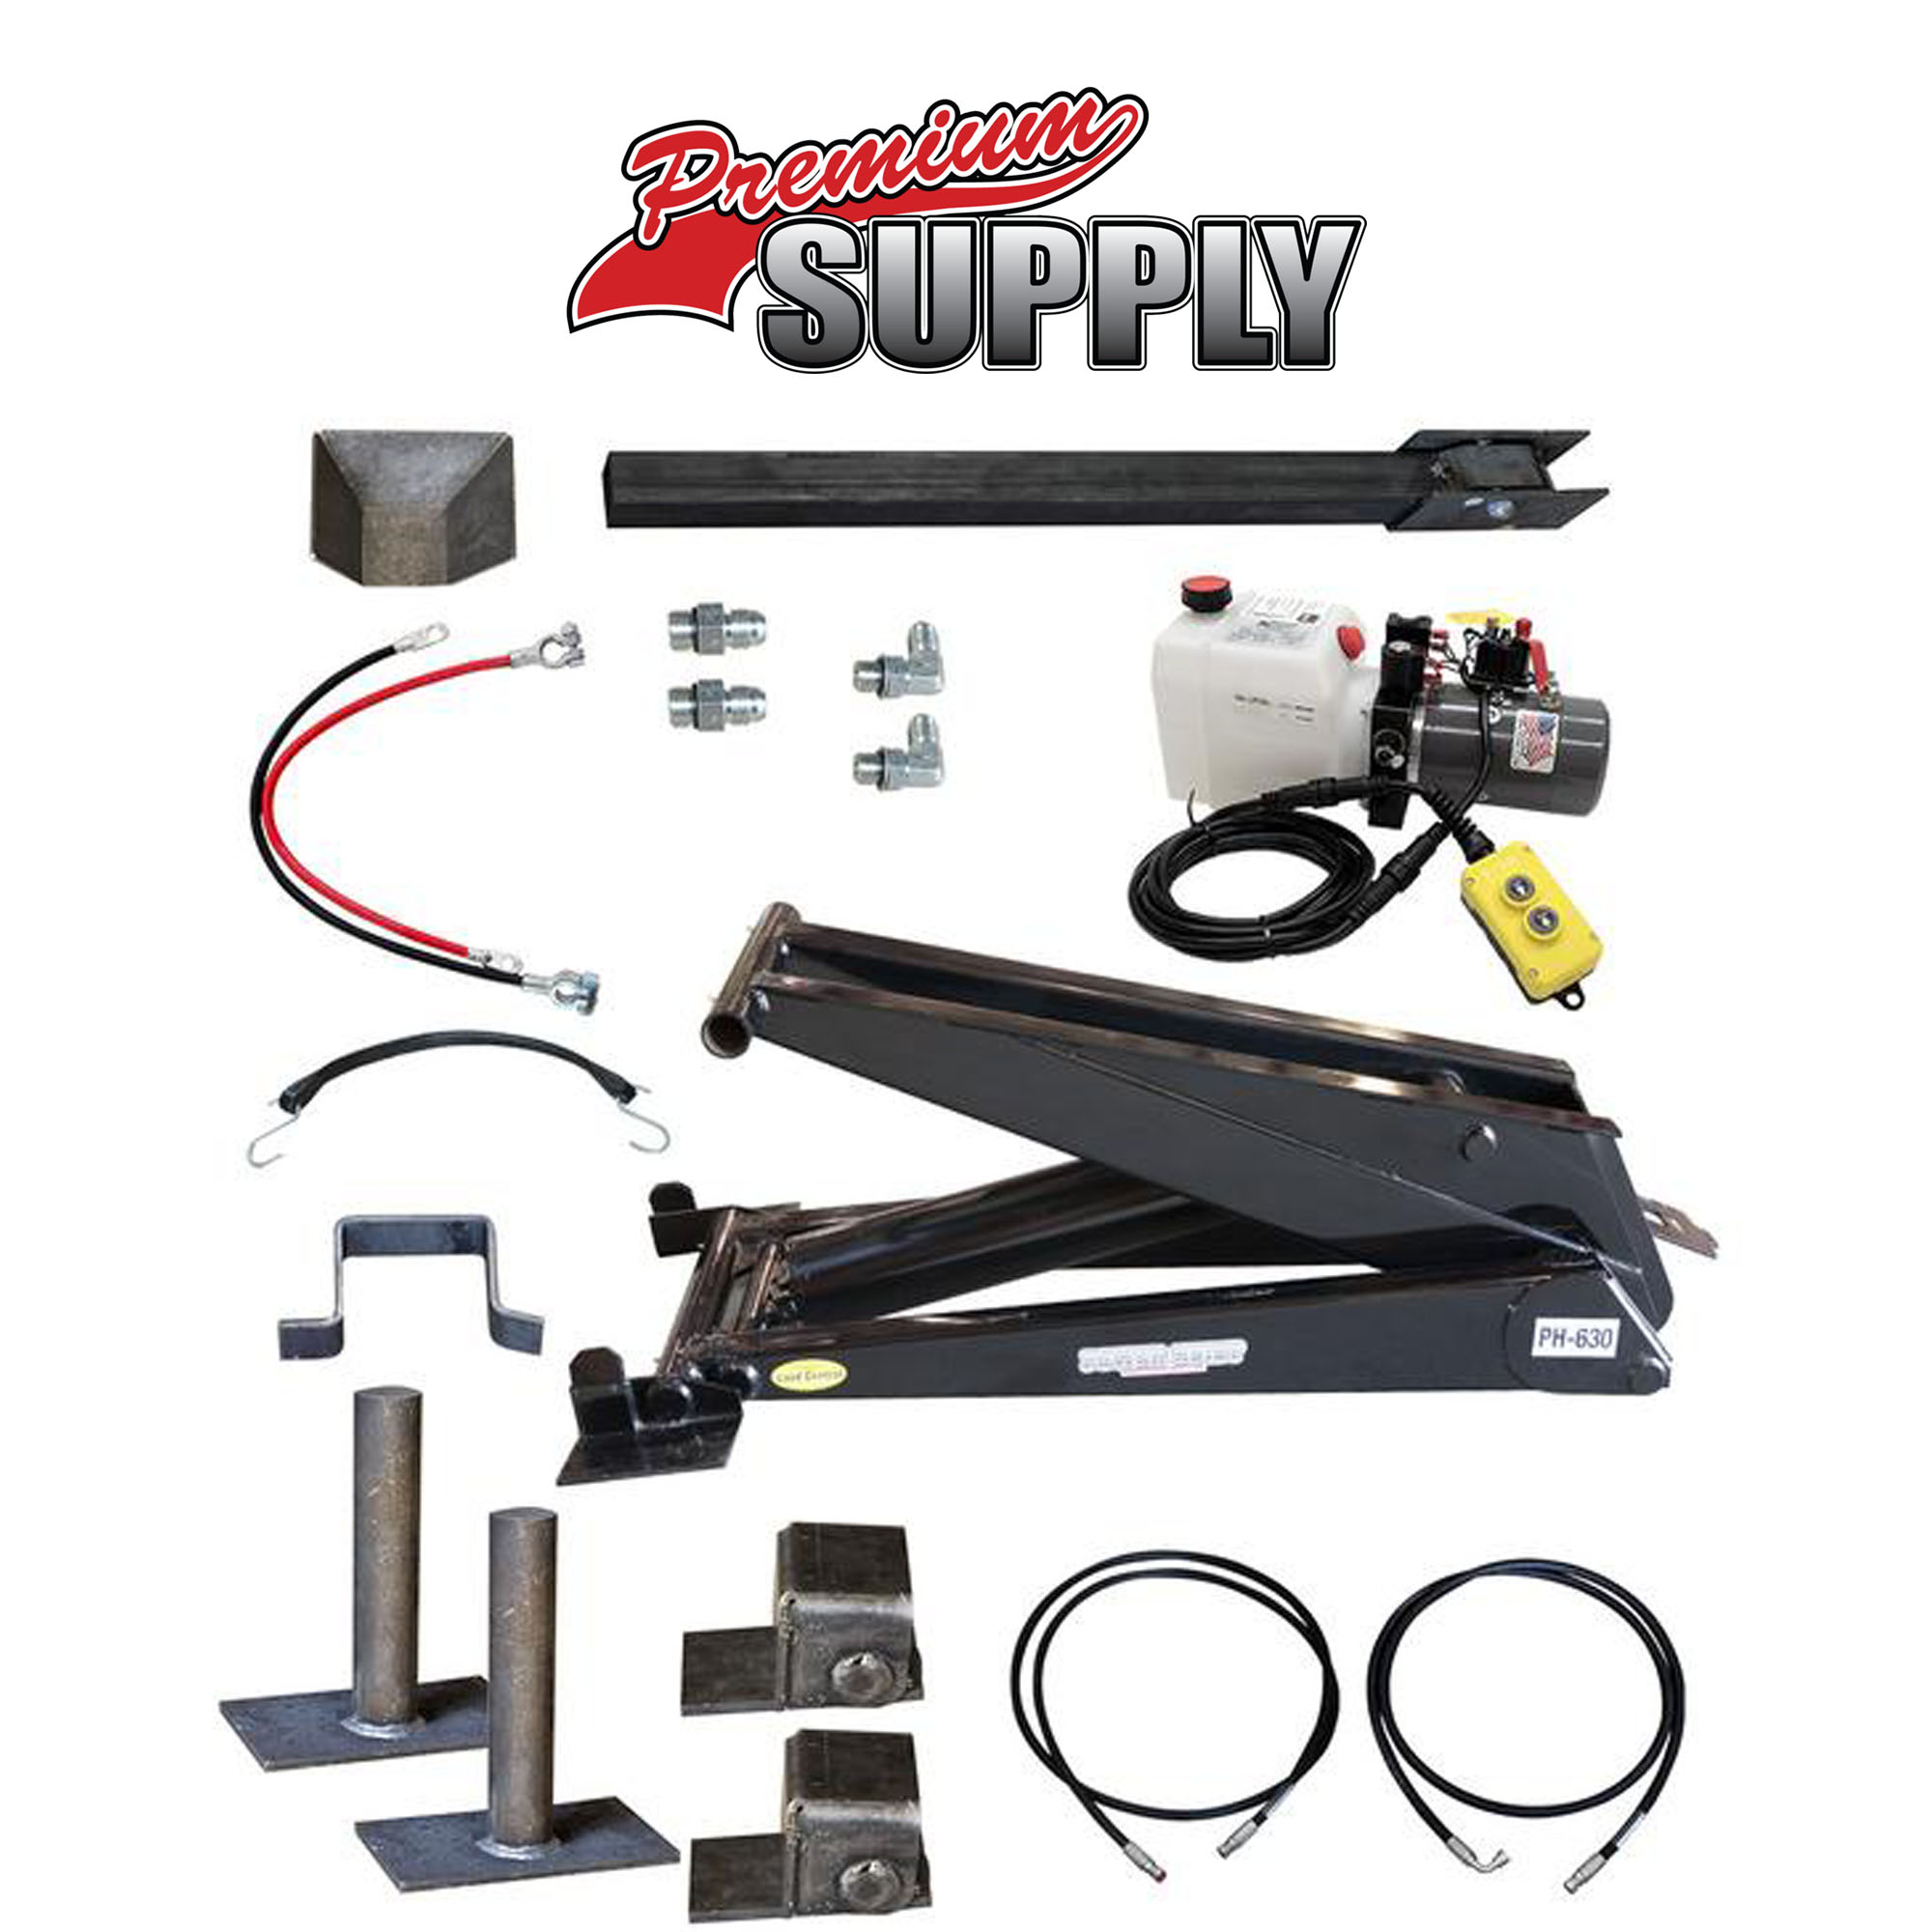 12 Ton (24,000 lb) Dump Trailer Hydraulic Scissor Hoist Kit - PH630 - Premium Supply